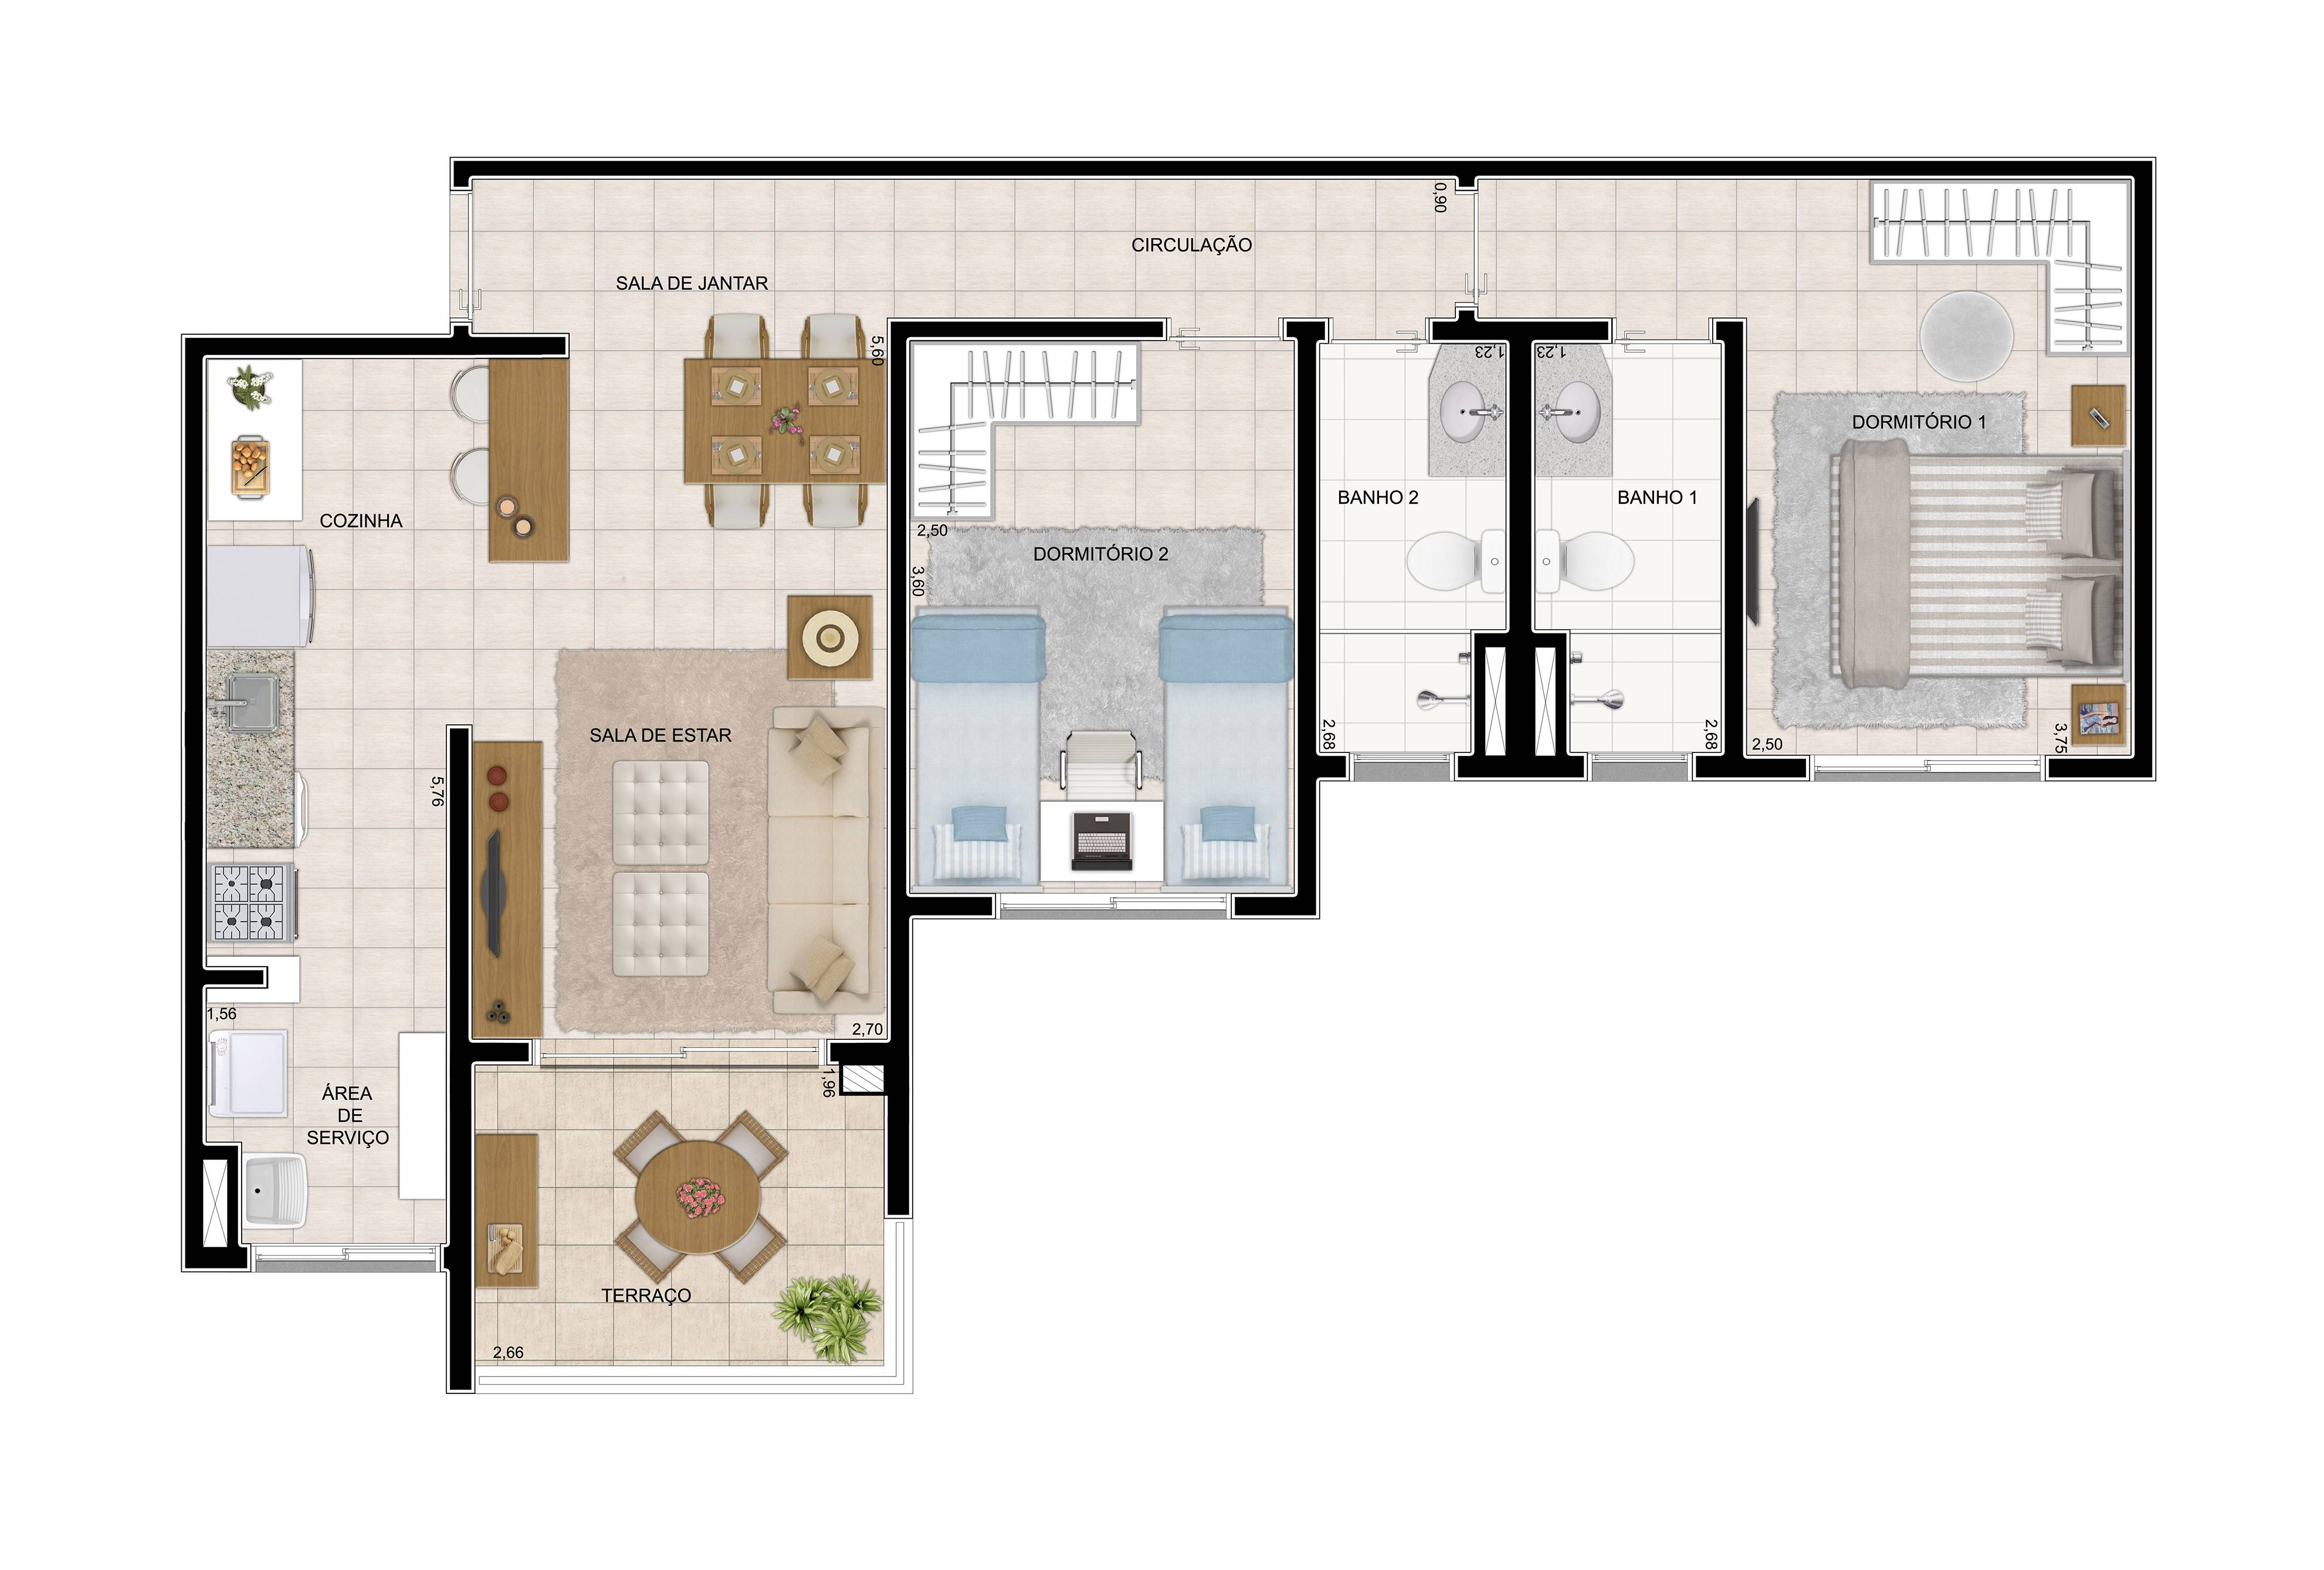 69 m² - 2 dorms